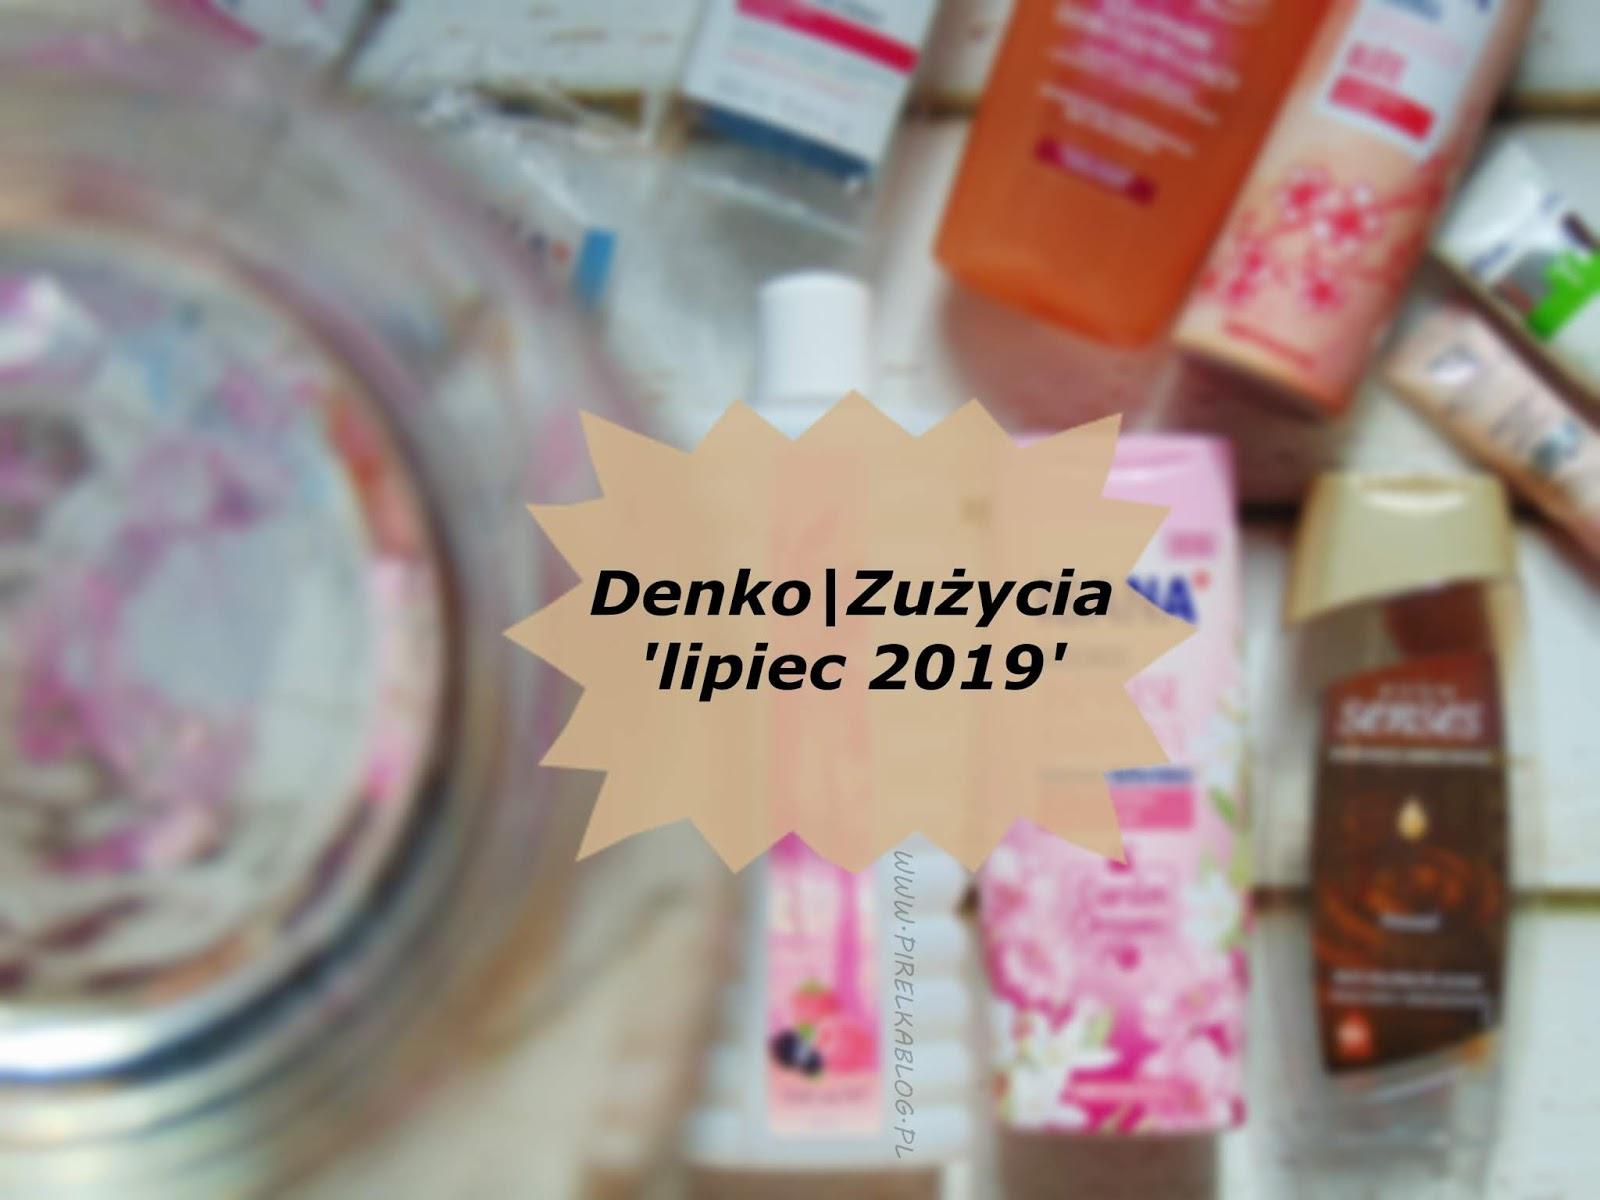 Denko | Zużycia 'lipiec 2019'